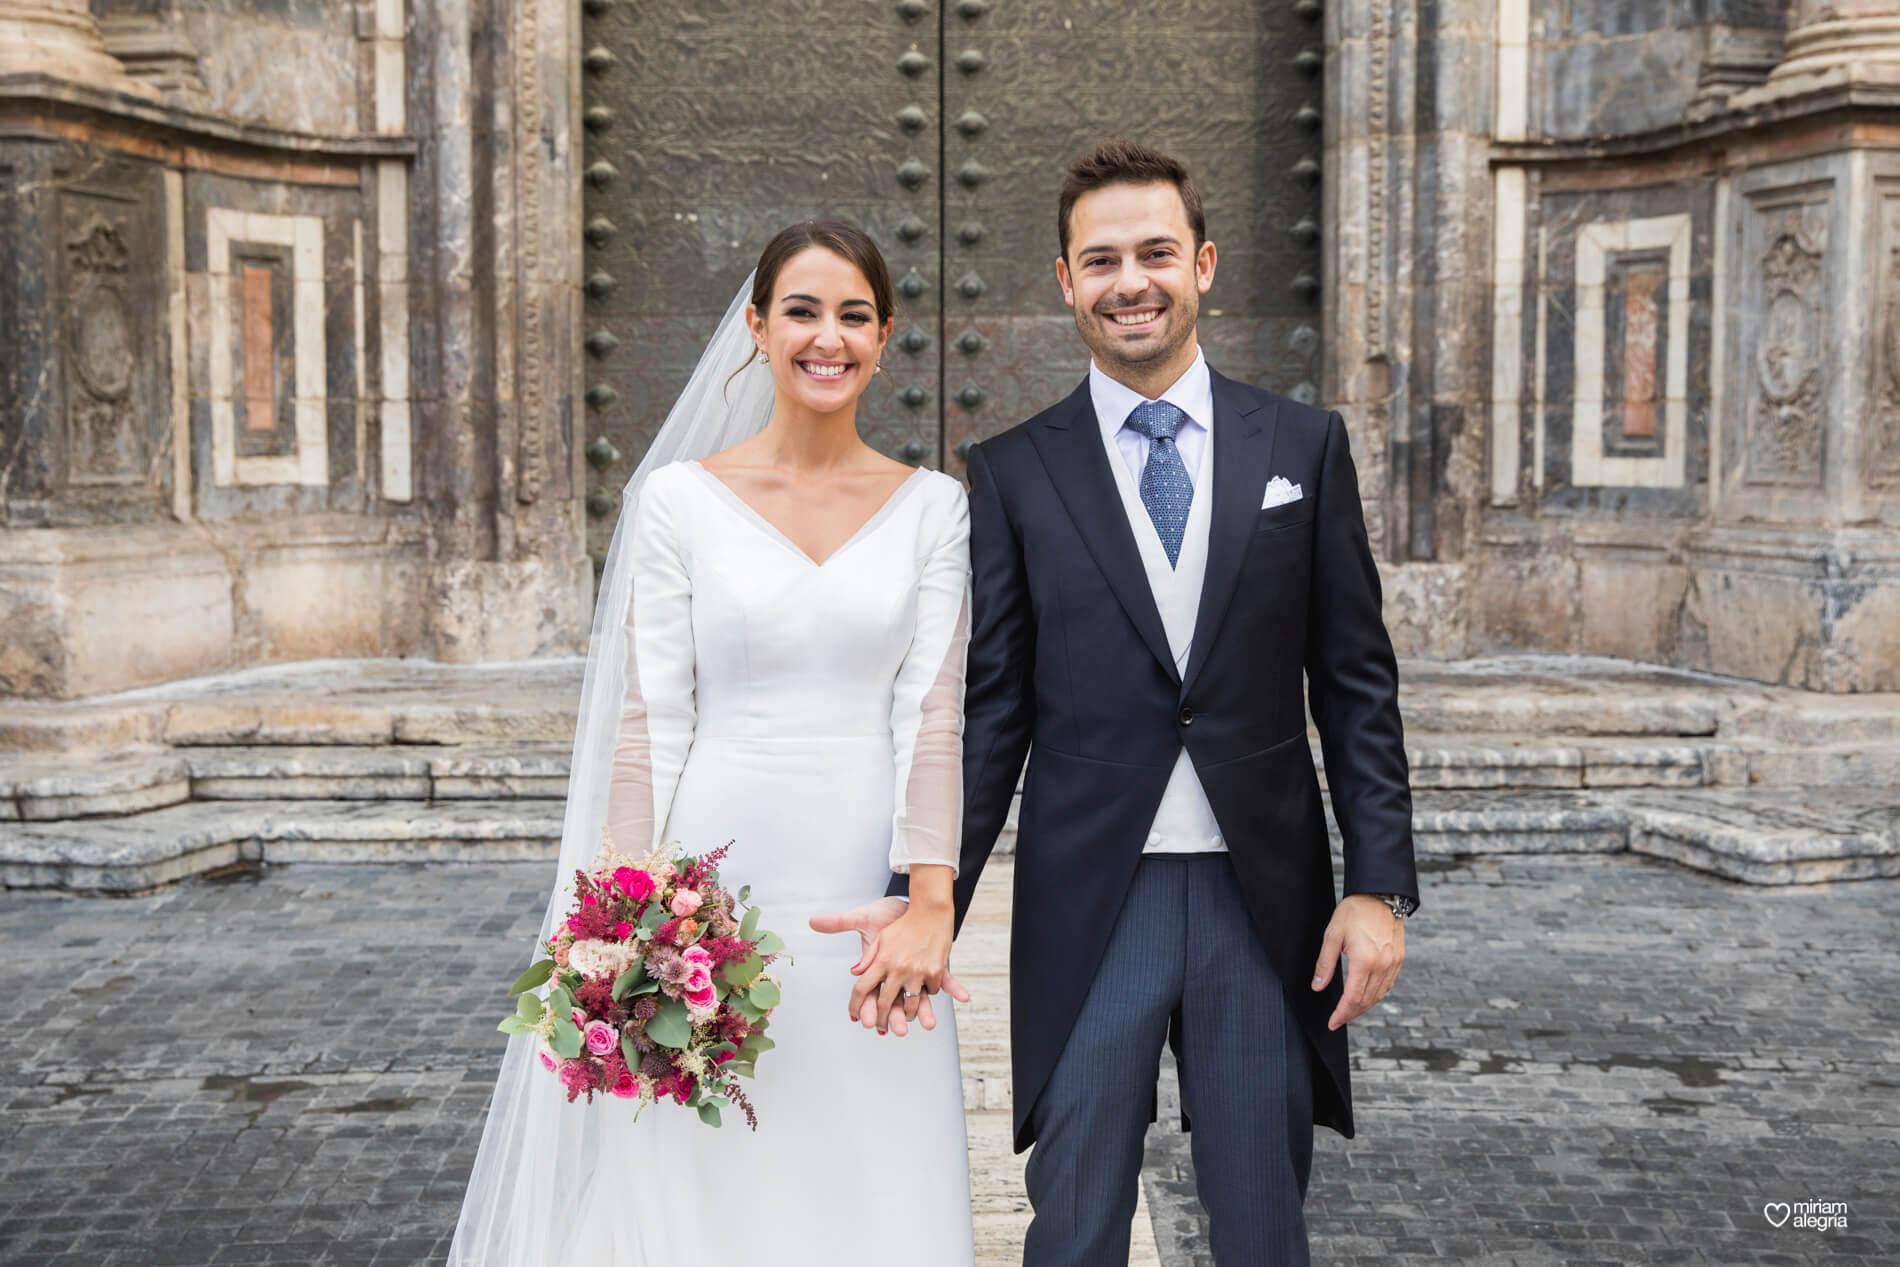 vestido-de-novia-paula-del-vas-miriam-alegria-fotografos-boda-murcia-94